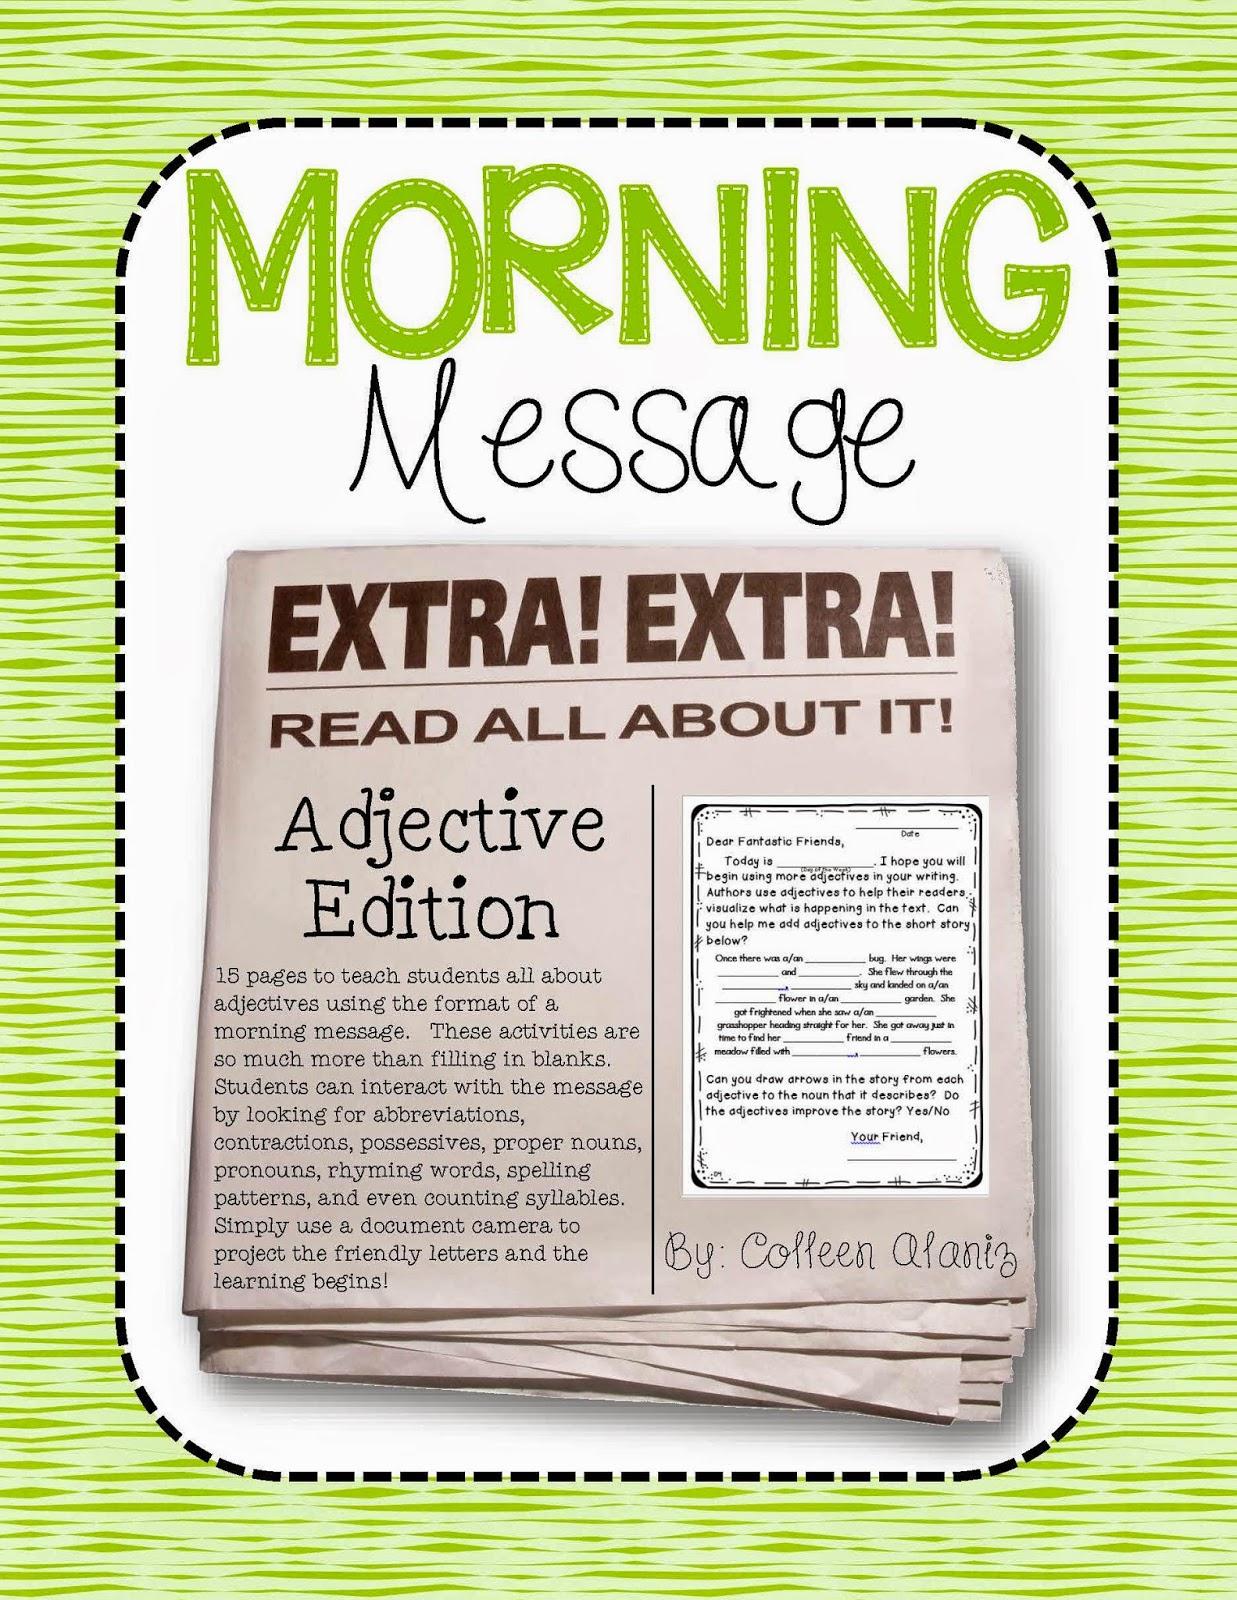 https://www.teacherspayteachers.com/Product/Morning-Message-Adjective-Edition-1708058